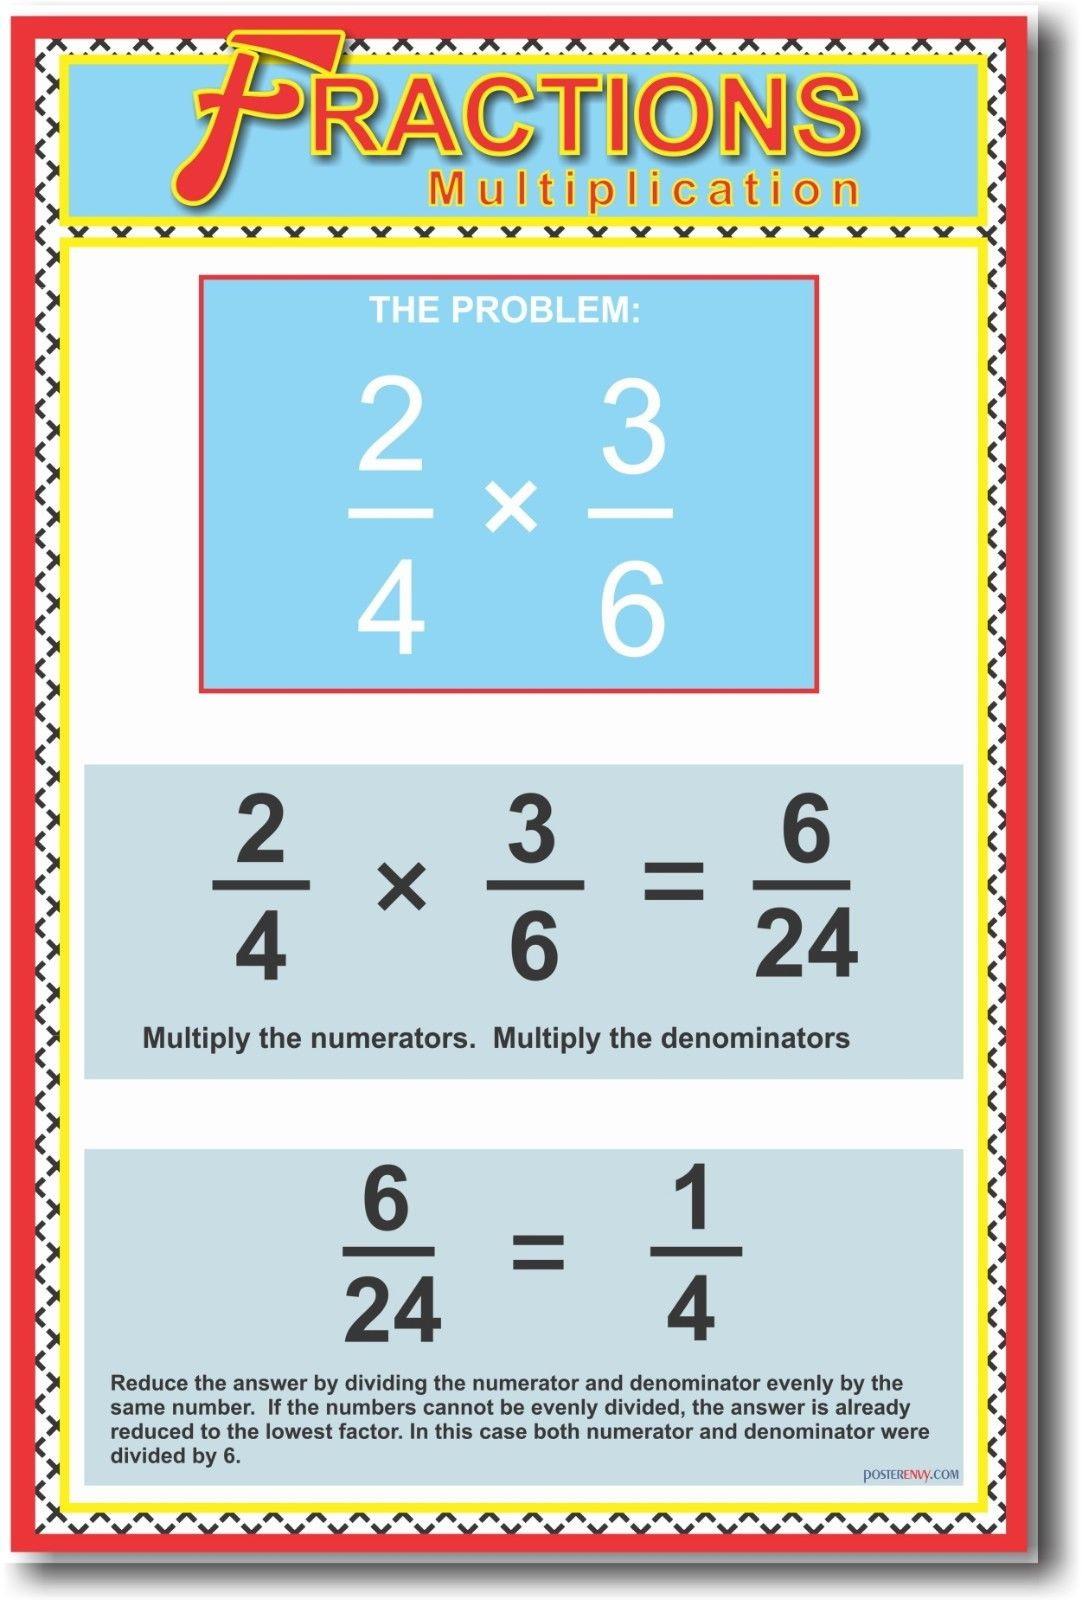 174217 fractions multiplication math common core decor wall print